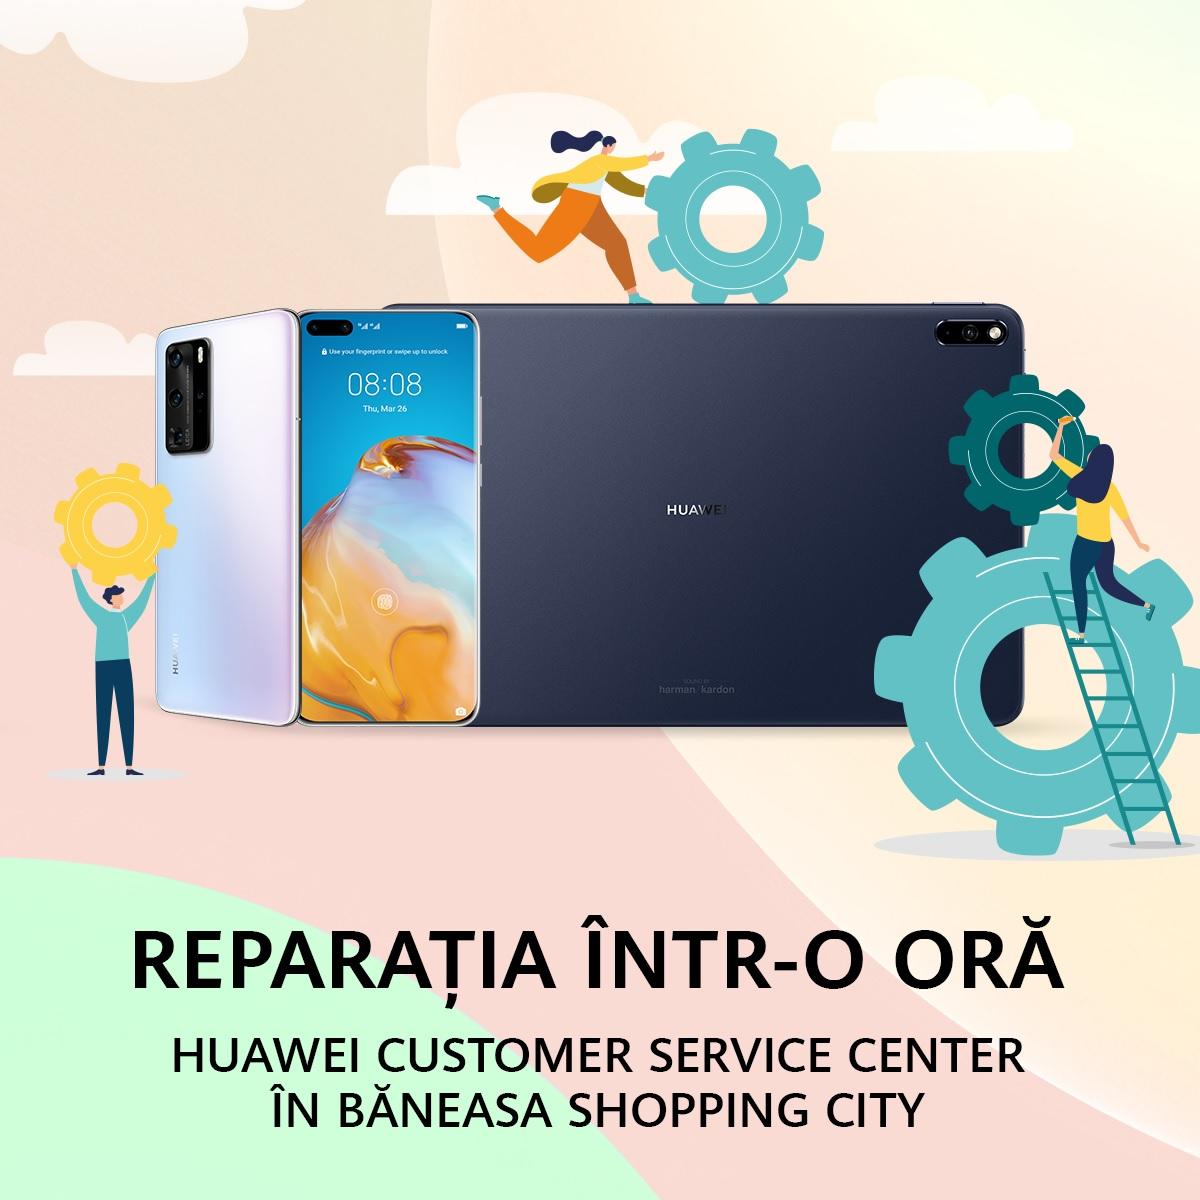 Huawei deschide un nou spațiu de service în Băneasa Shopping City